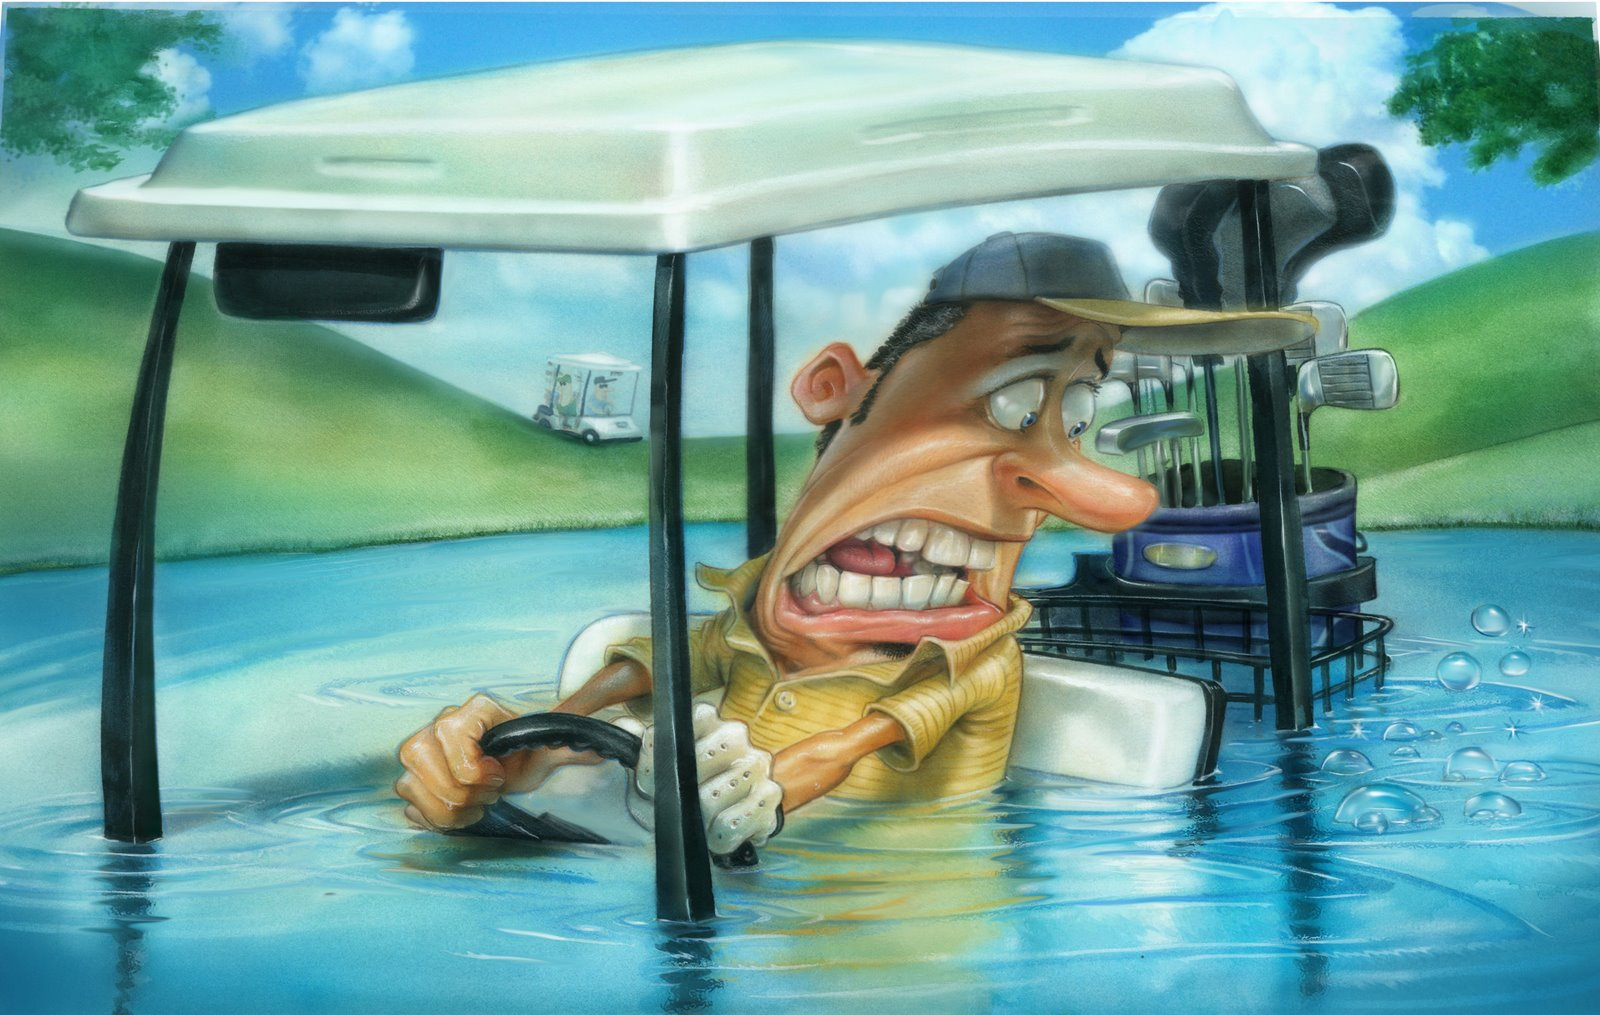 http://4.bp.blogspot.com/-z2hWWziI6Bc/TnyI6Ni0UmI/AAAAAAAAOcc/oIaF8HmkXmo/s1600/Fantastic+Cartoon+Artwork+%252838%2529.jpg